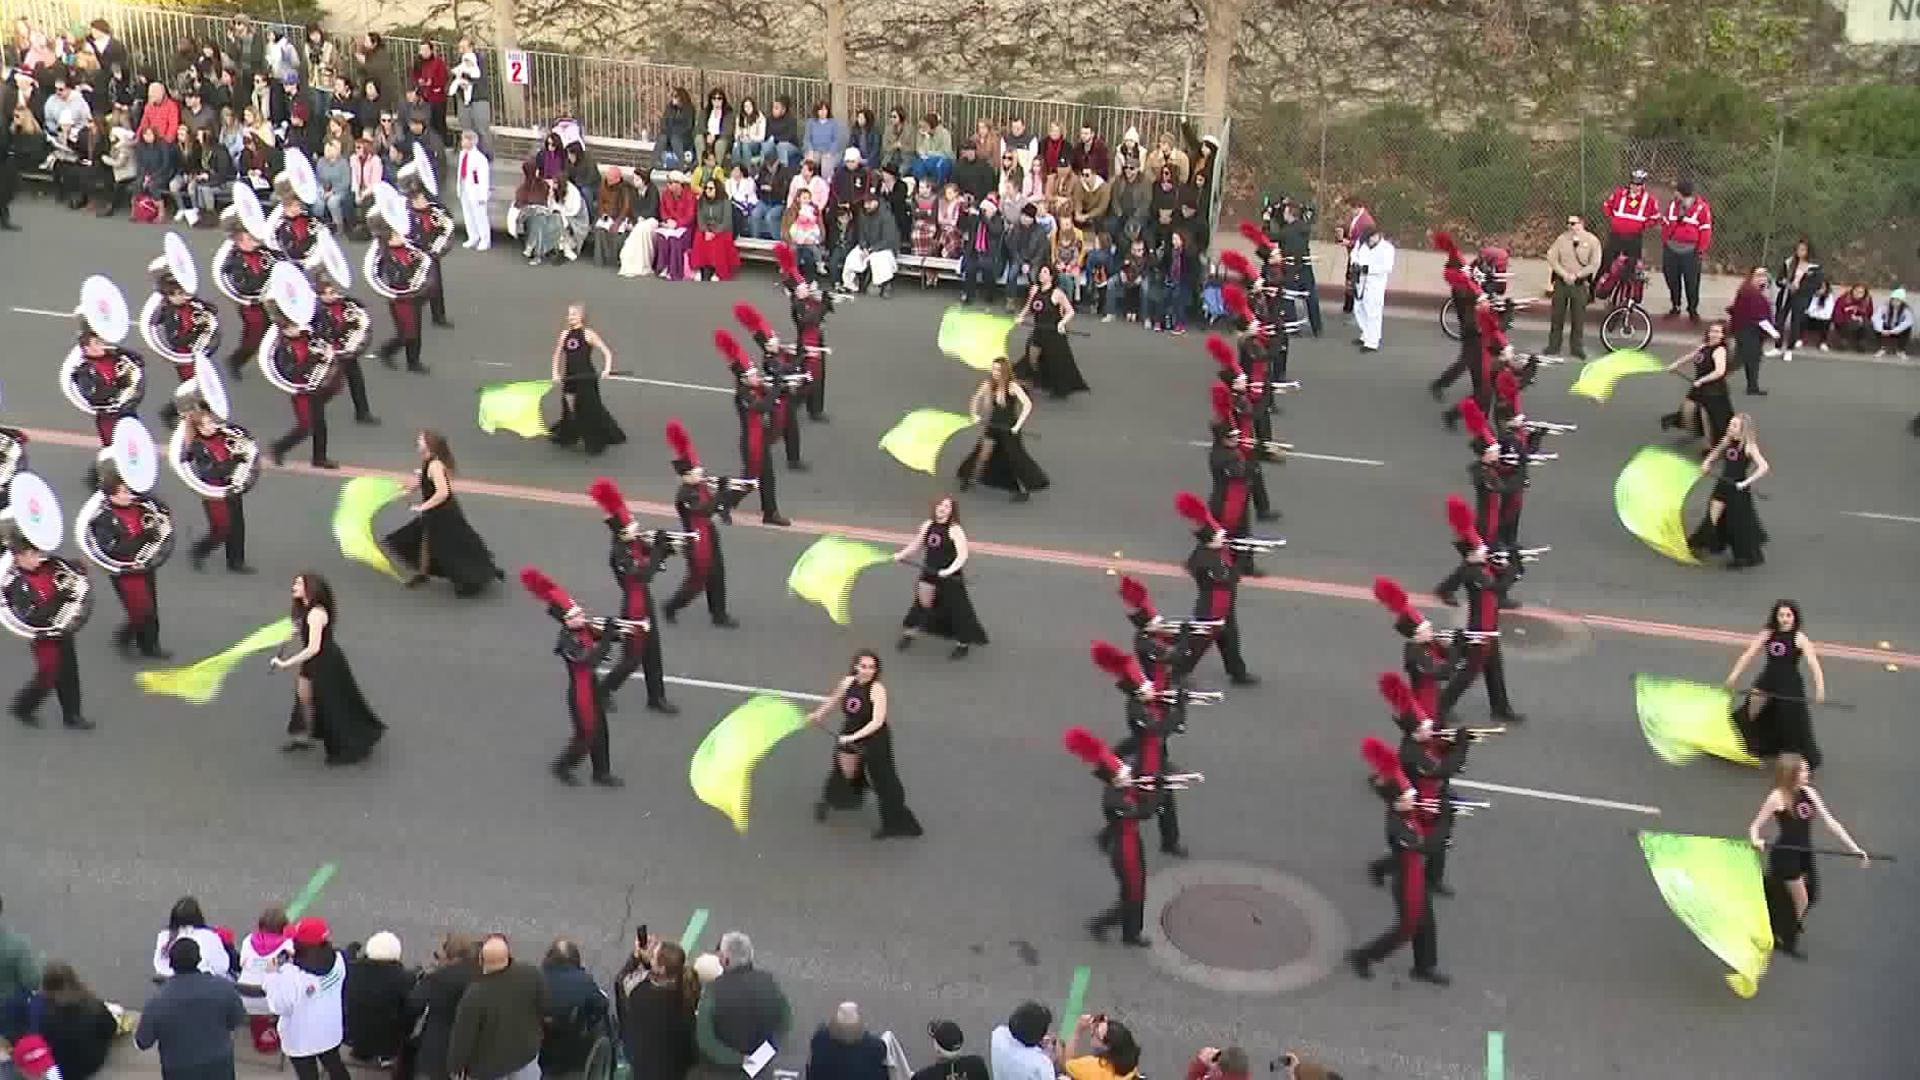 A marching band passes by KTLA's Band Cam at the 131st Rose Parade on Jan. 1, 2020. (Credit: KTLA)